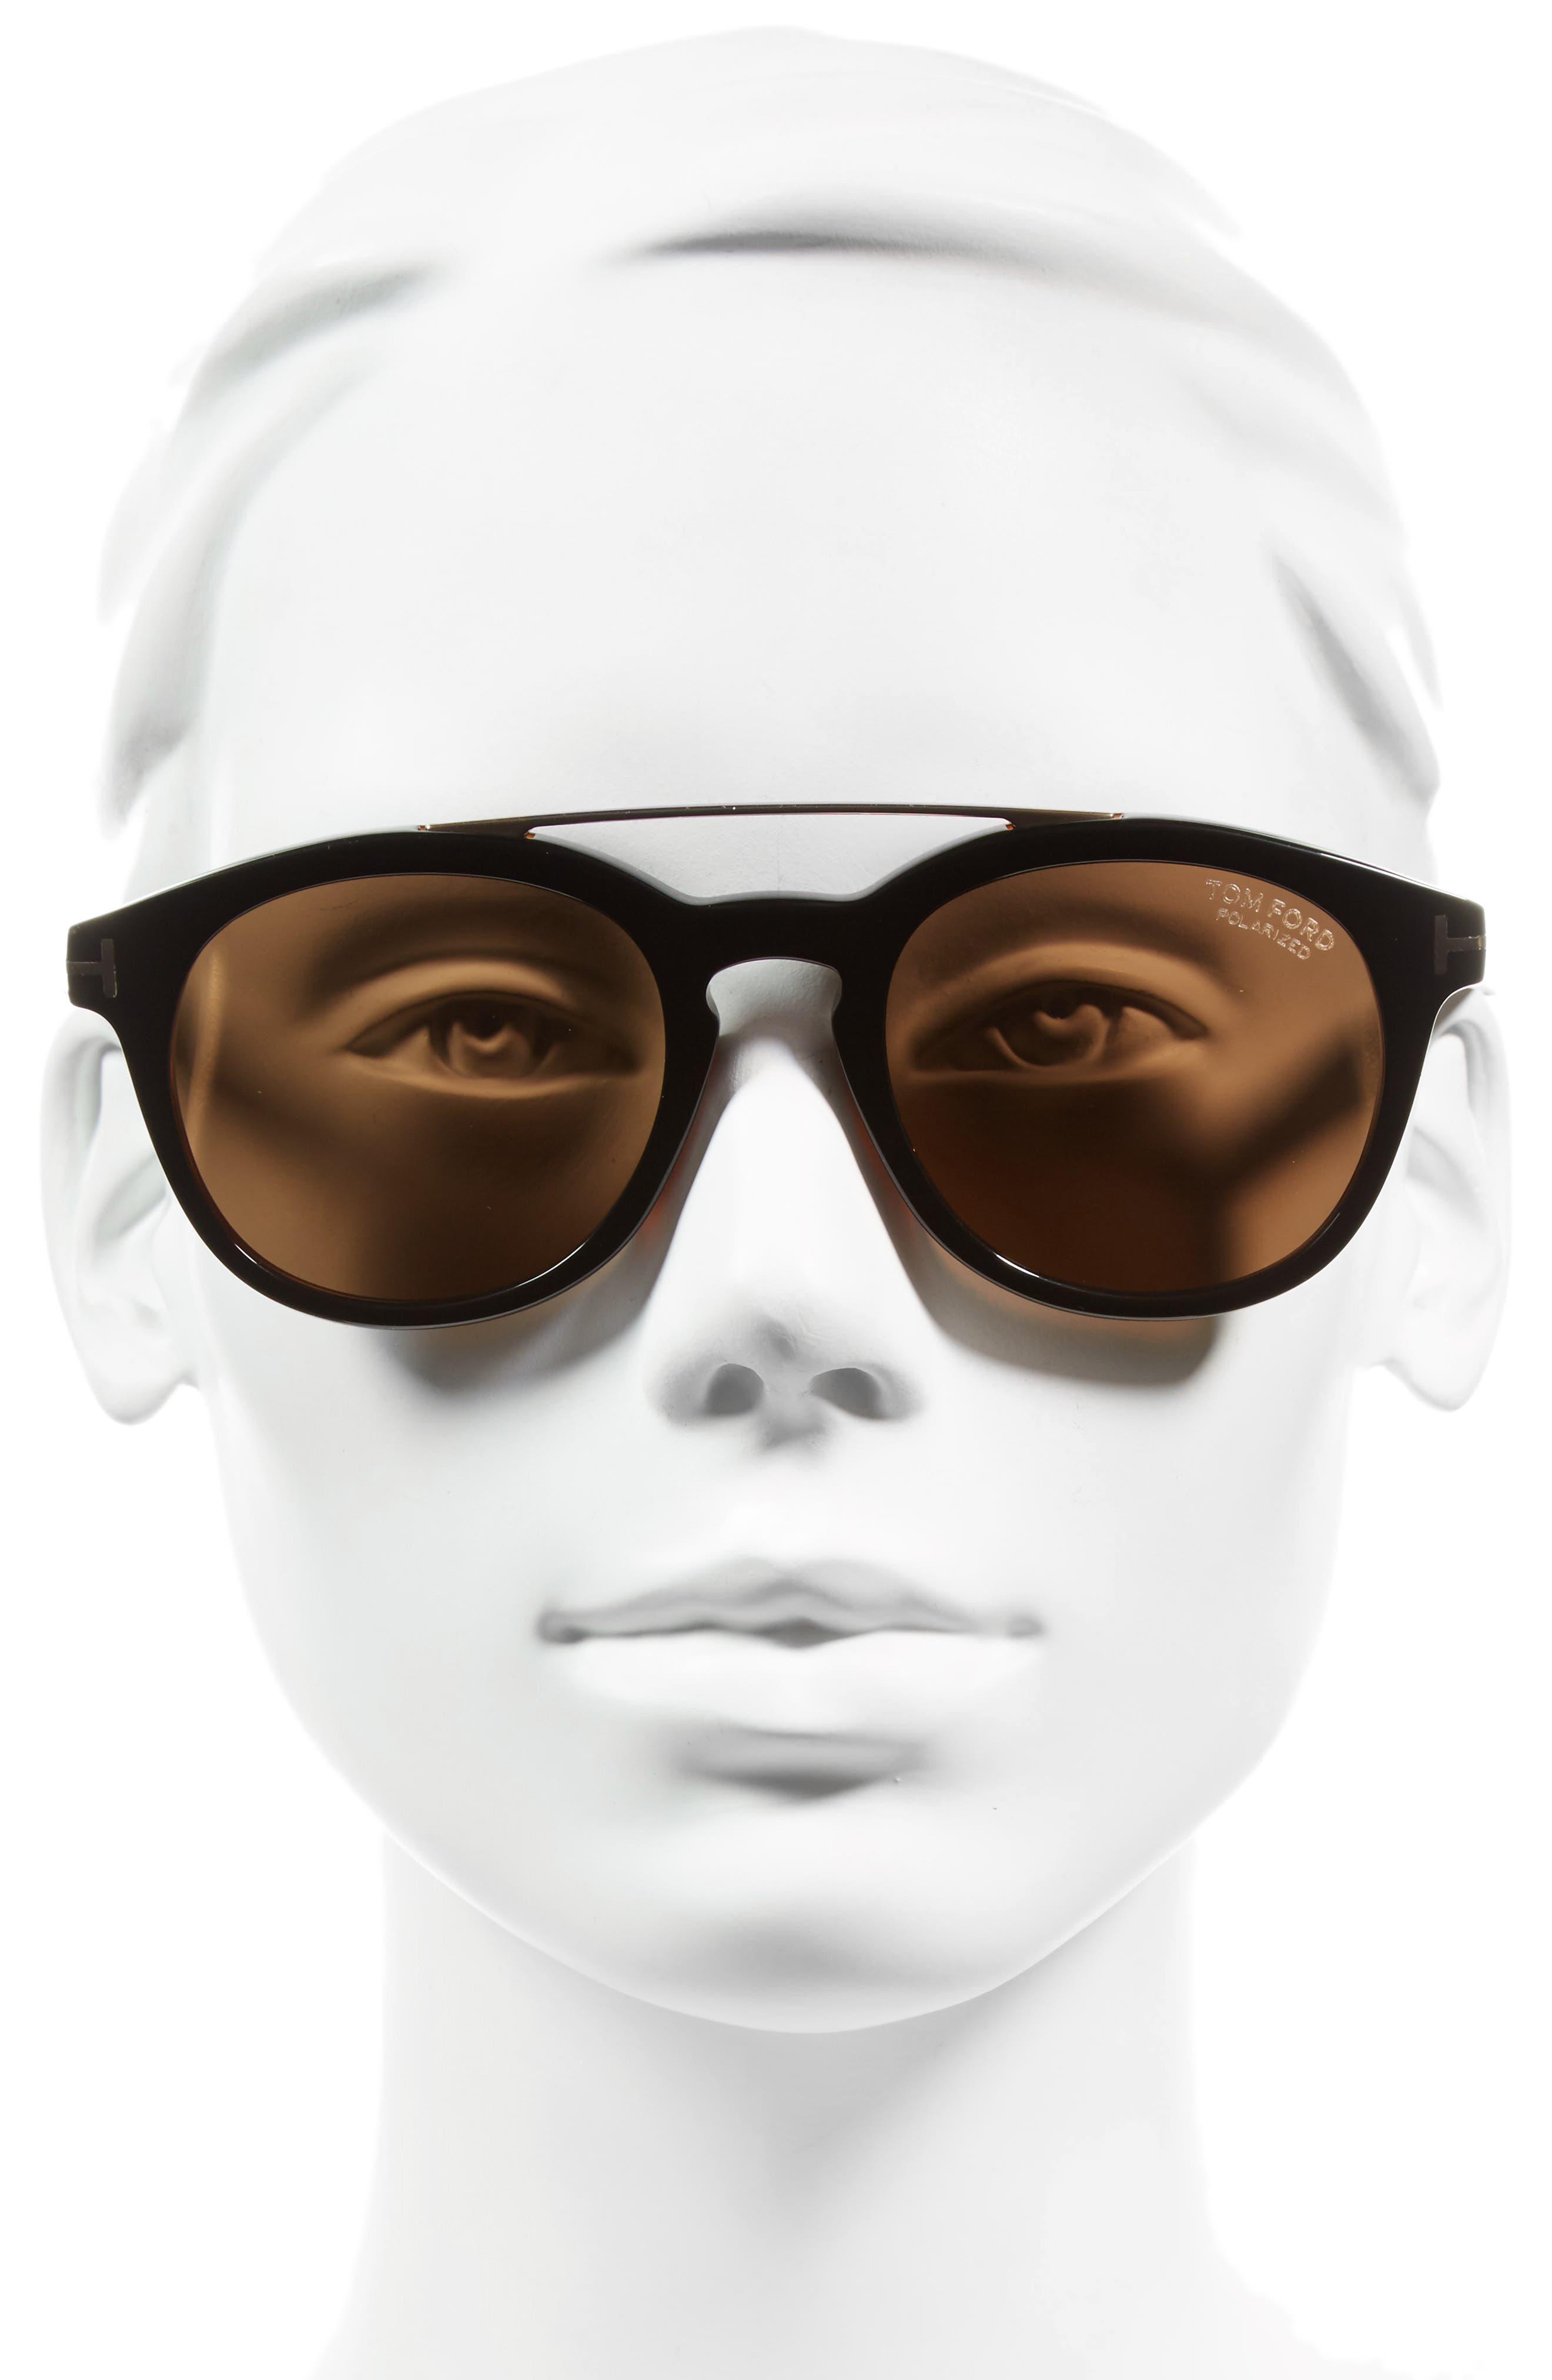 Newman 53mm Polarized Sunglasses,                             Alternate thumbnail 2, color,                             001